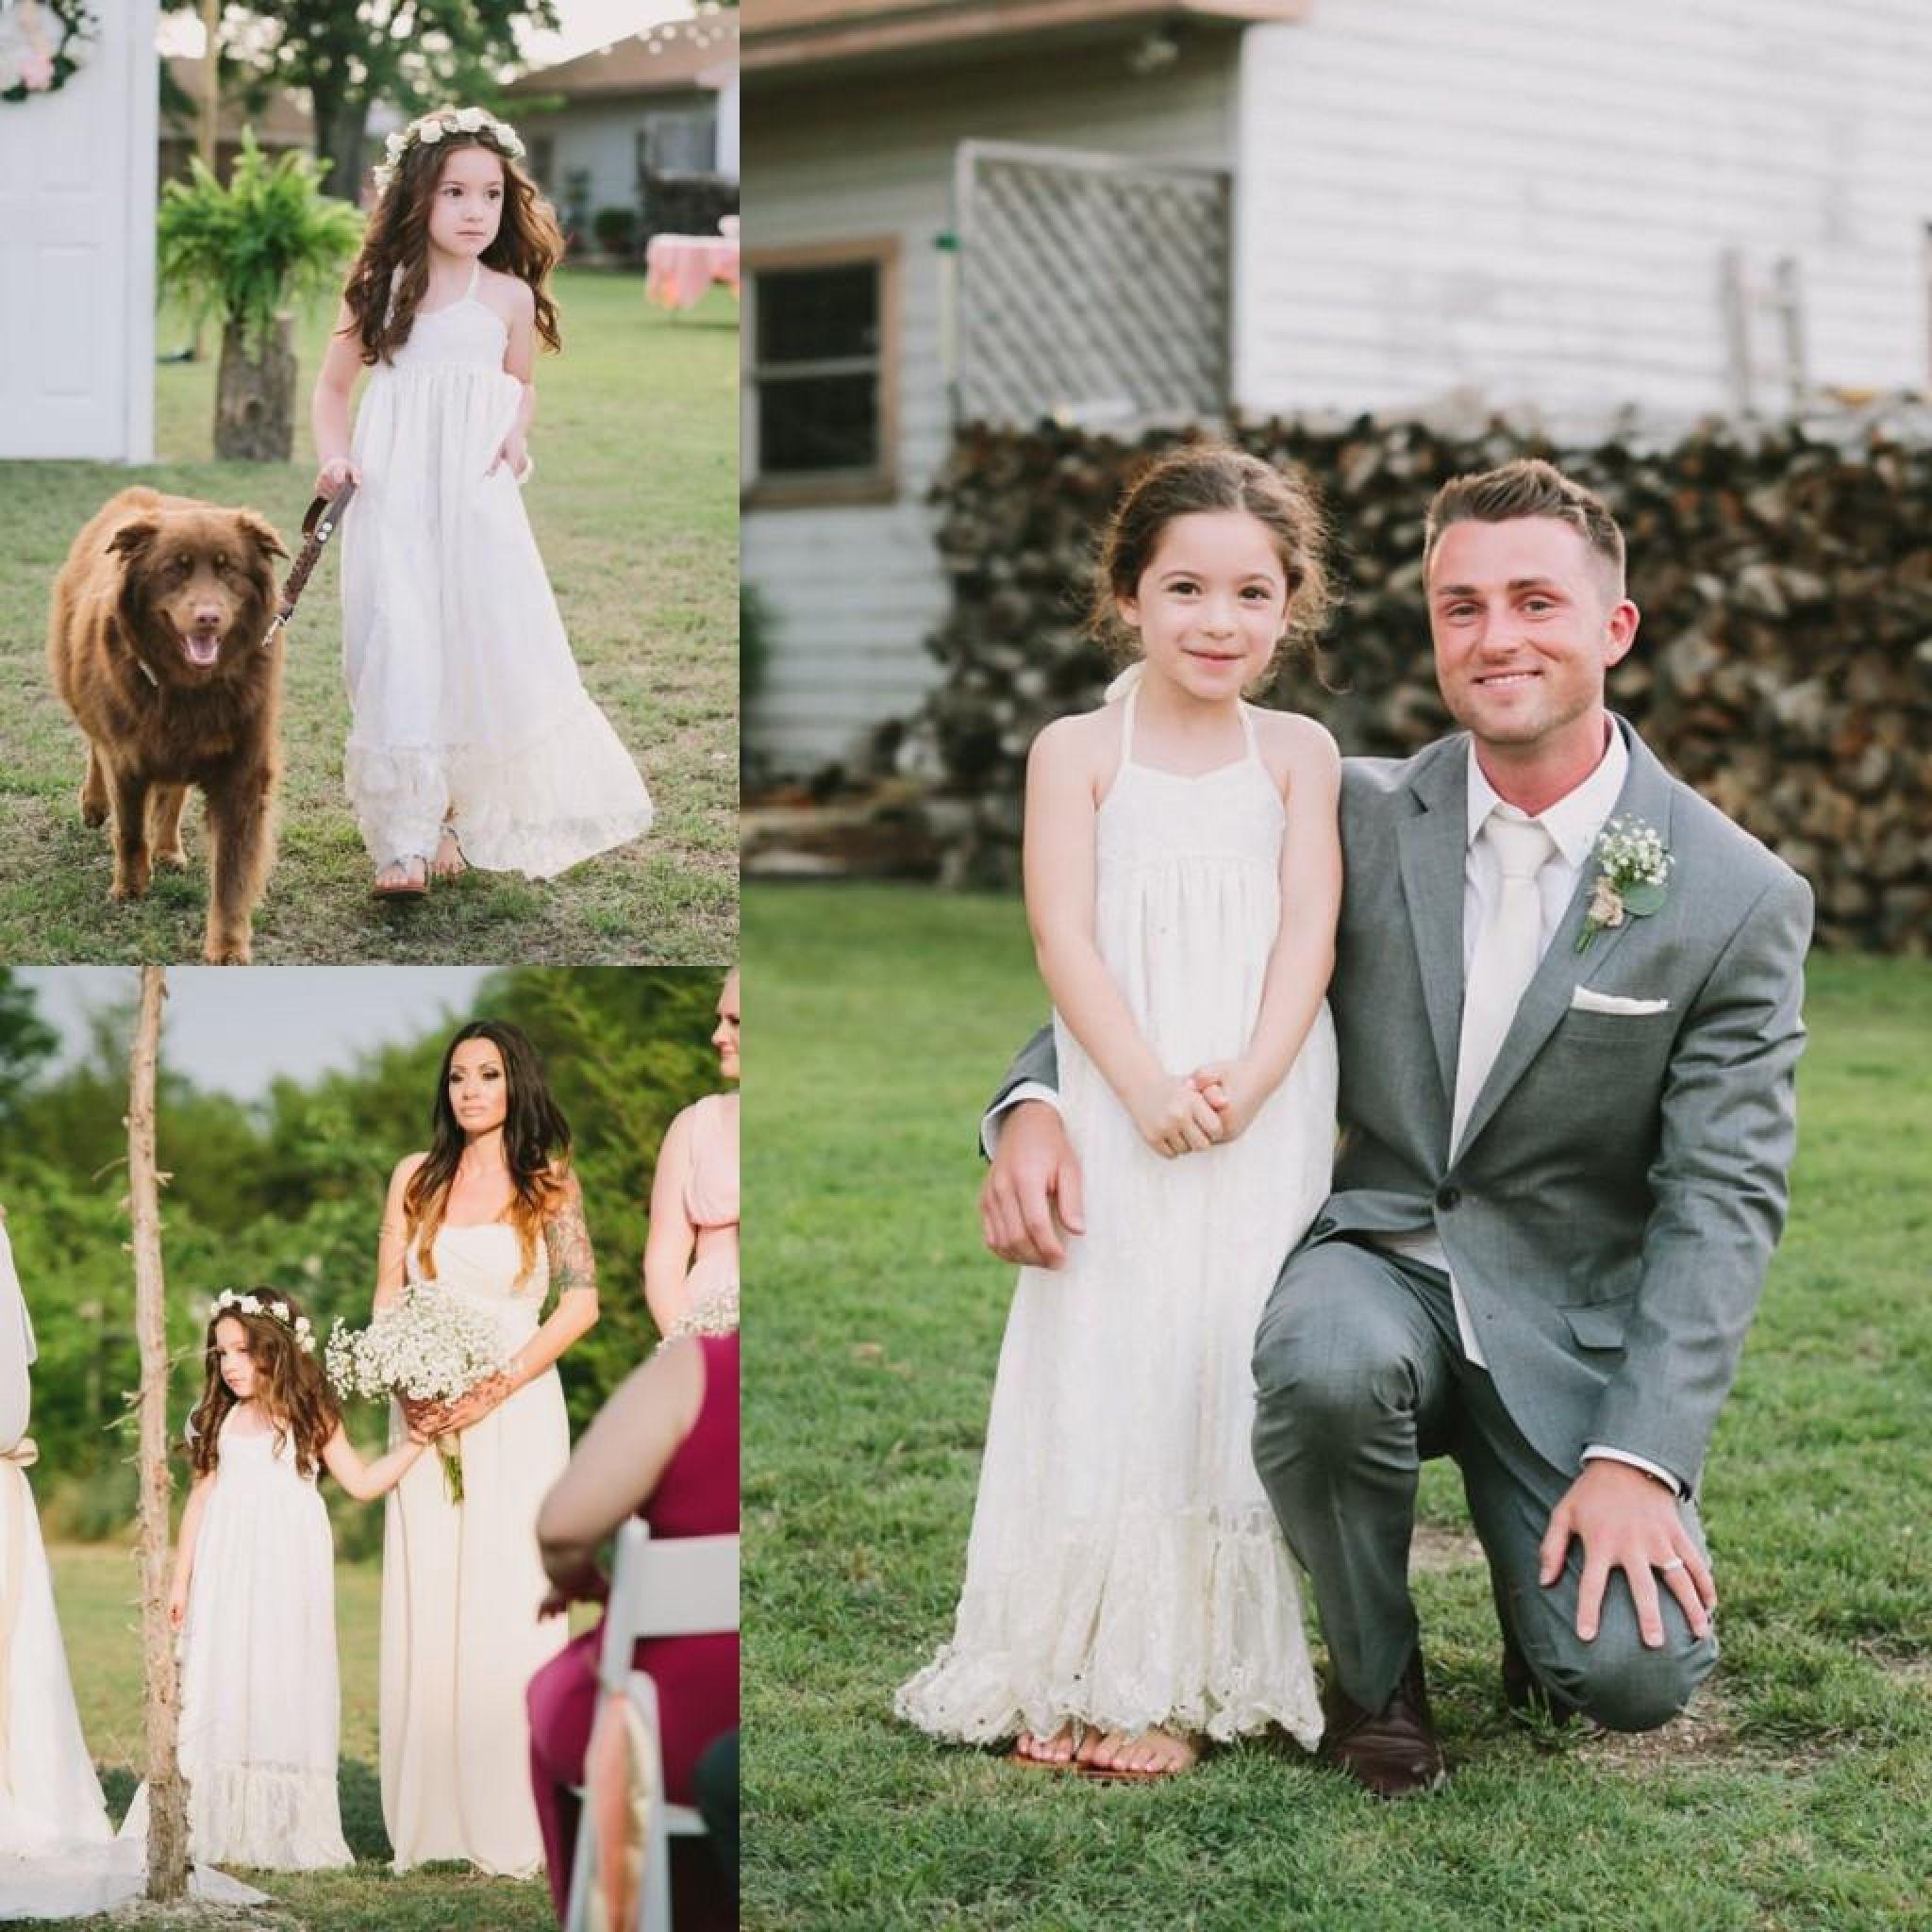 Country wedding flower girl dress best shapewear for wedding dress